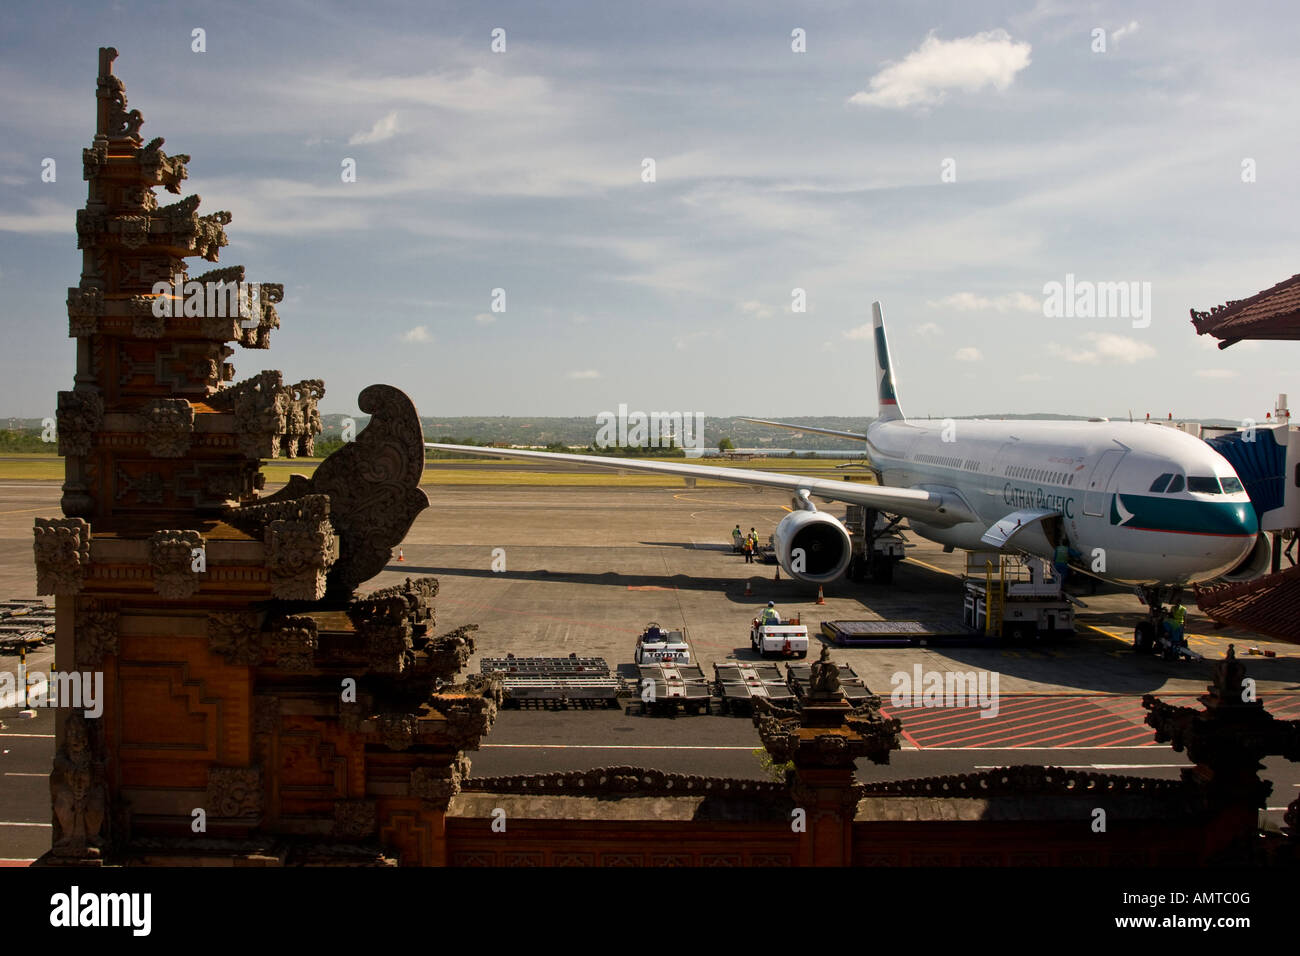 Aeroporto Bali : Garuda avião denpasar ou aeroporto internacional ngurah rai dps